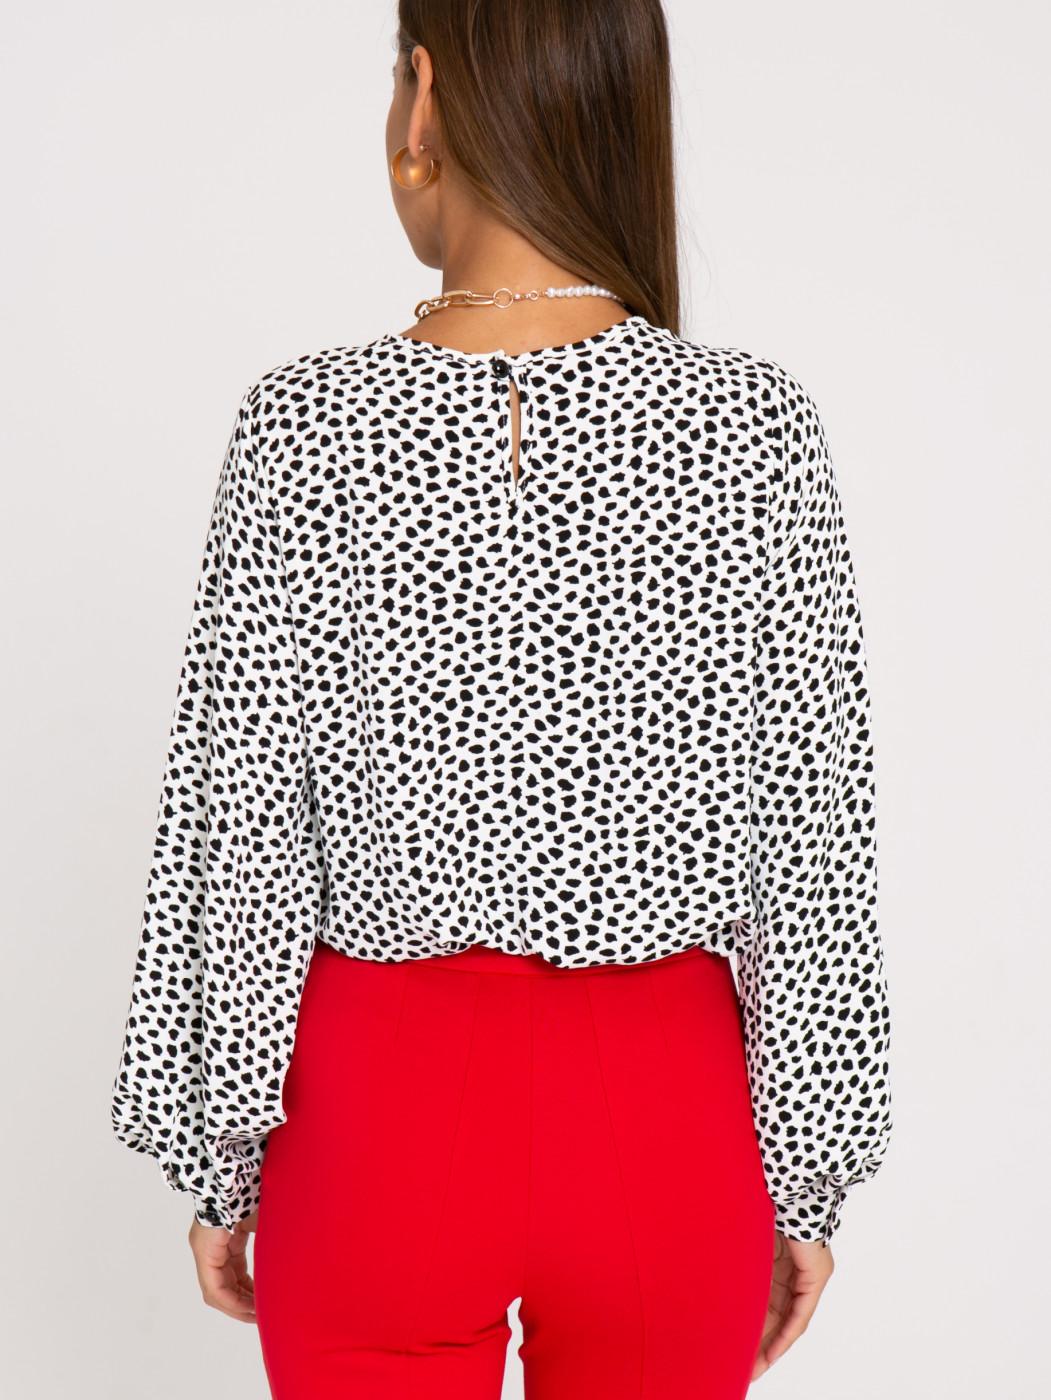 Блузка А403 цвет: молочный